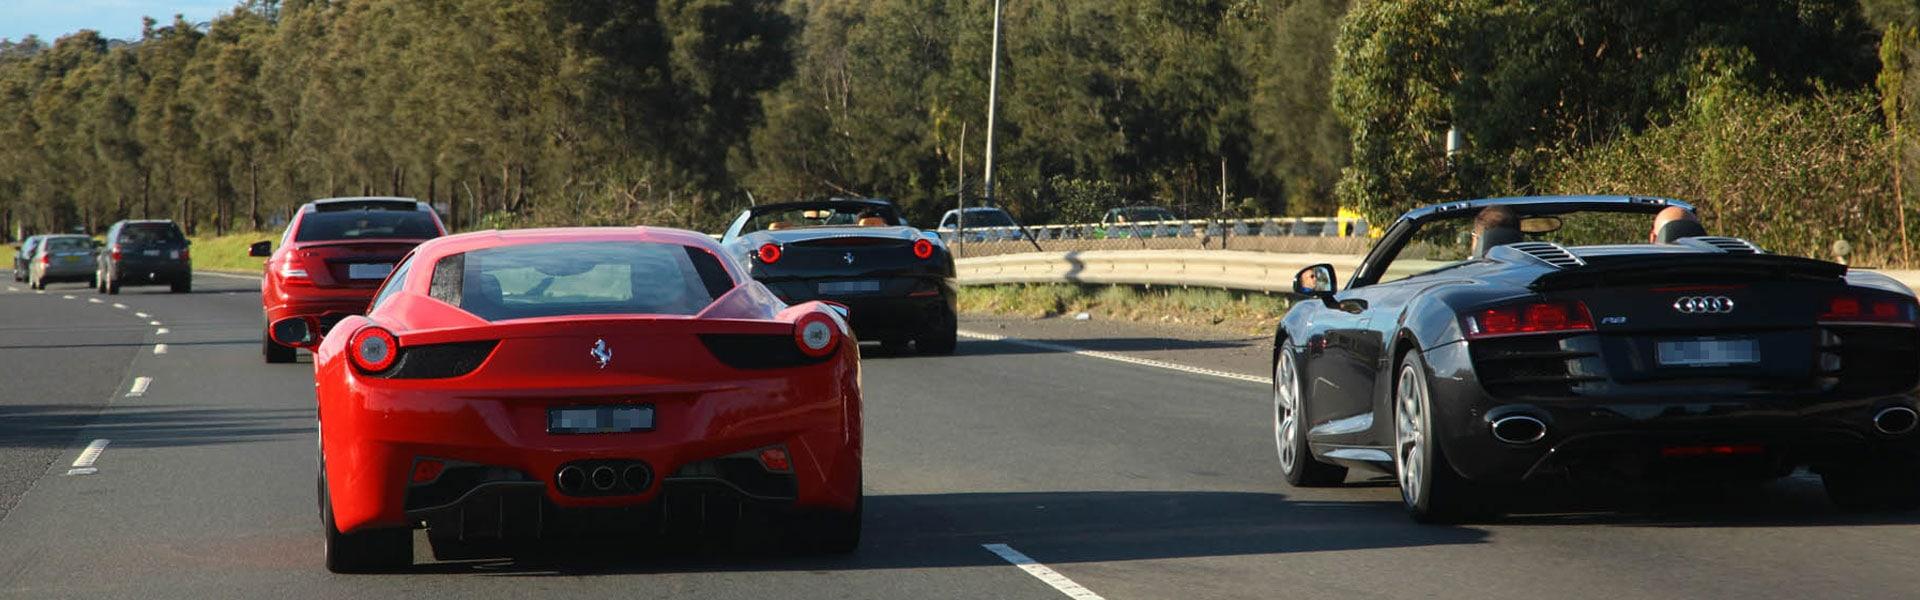 Ultimate Rentals Australia Drive Day